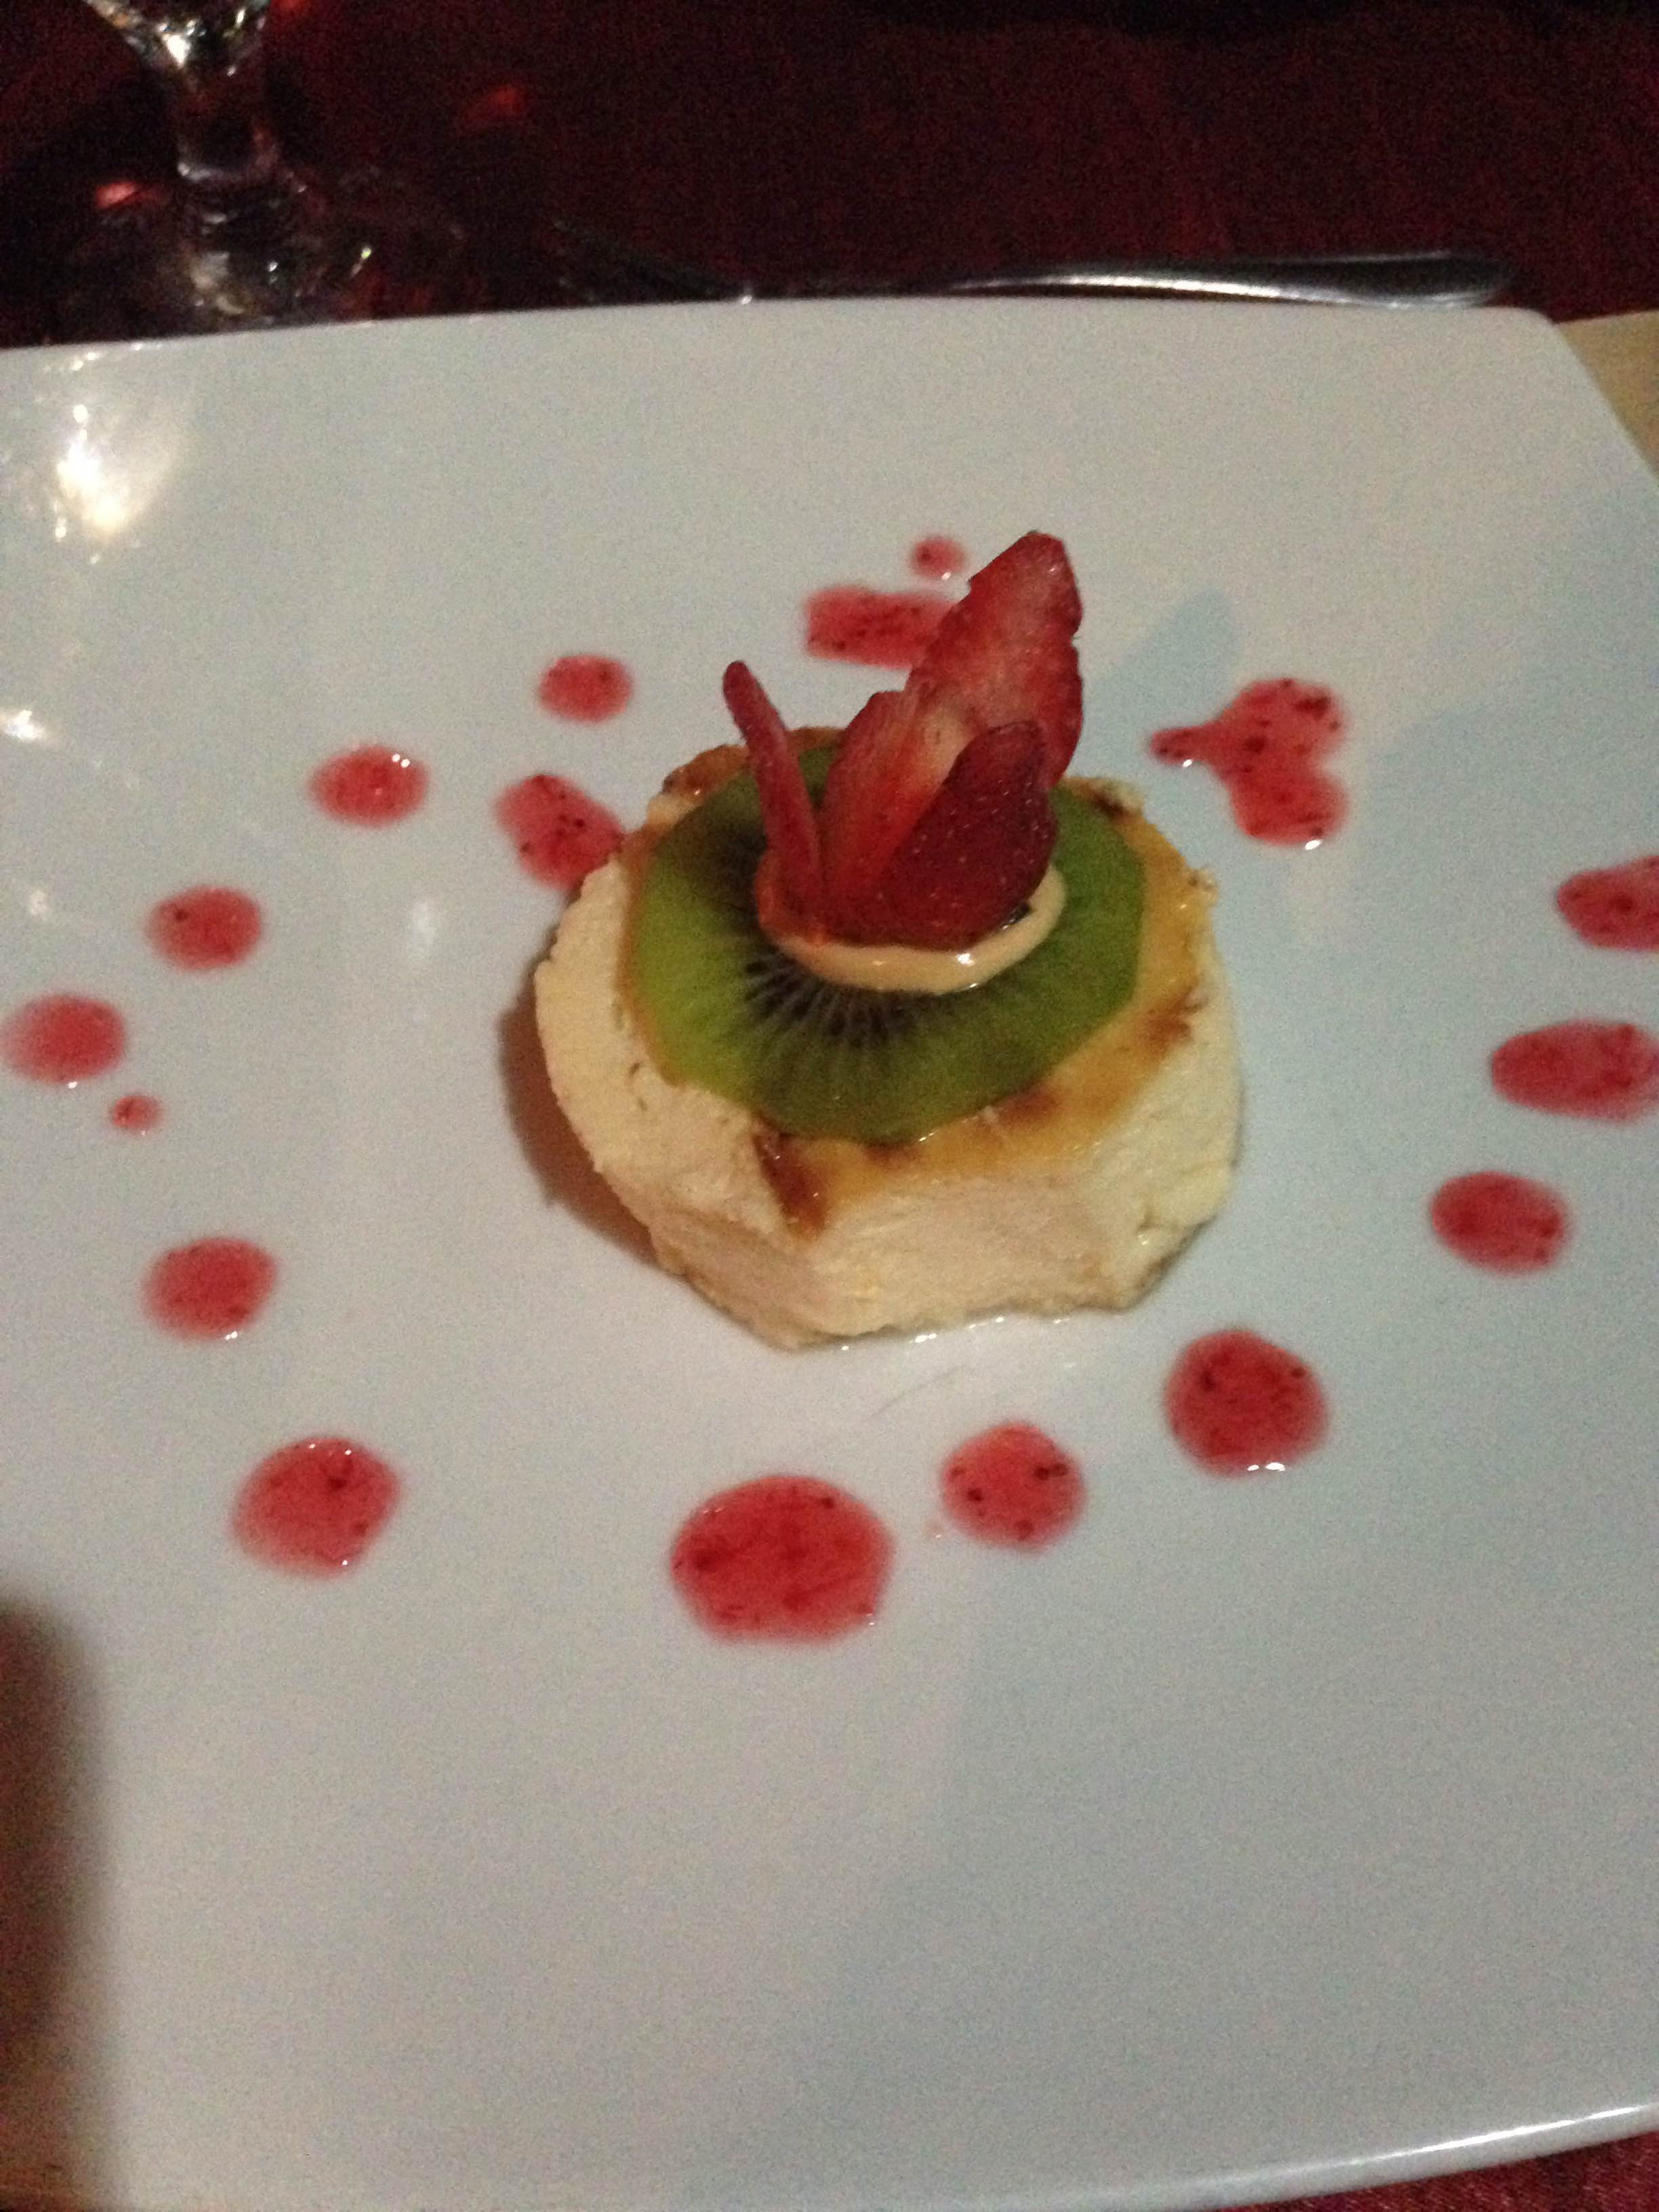 Very light, whipped cheesecake for dessert